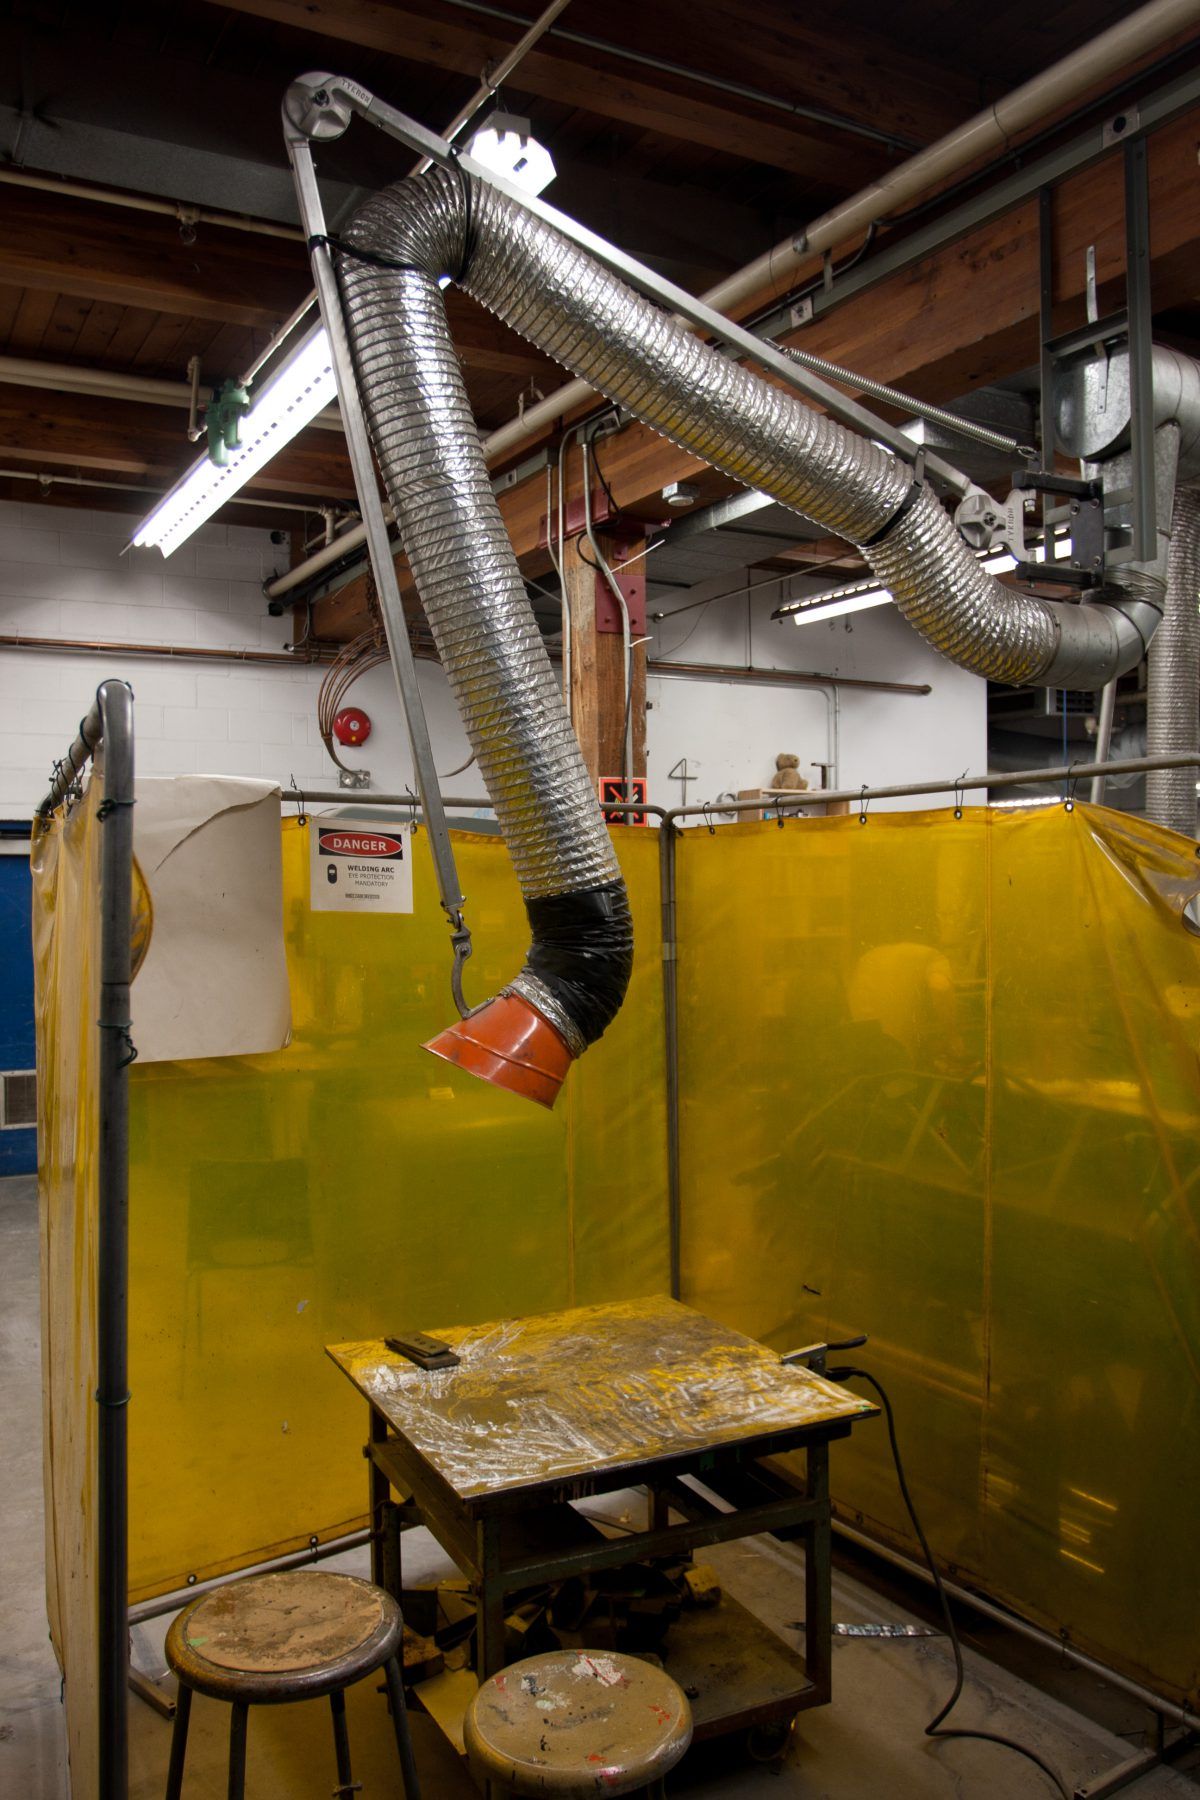 Pipe - At Emily Carr University metal workshop, metal, workshop, machine